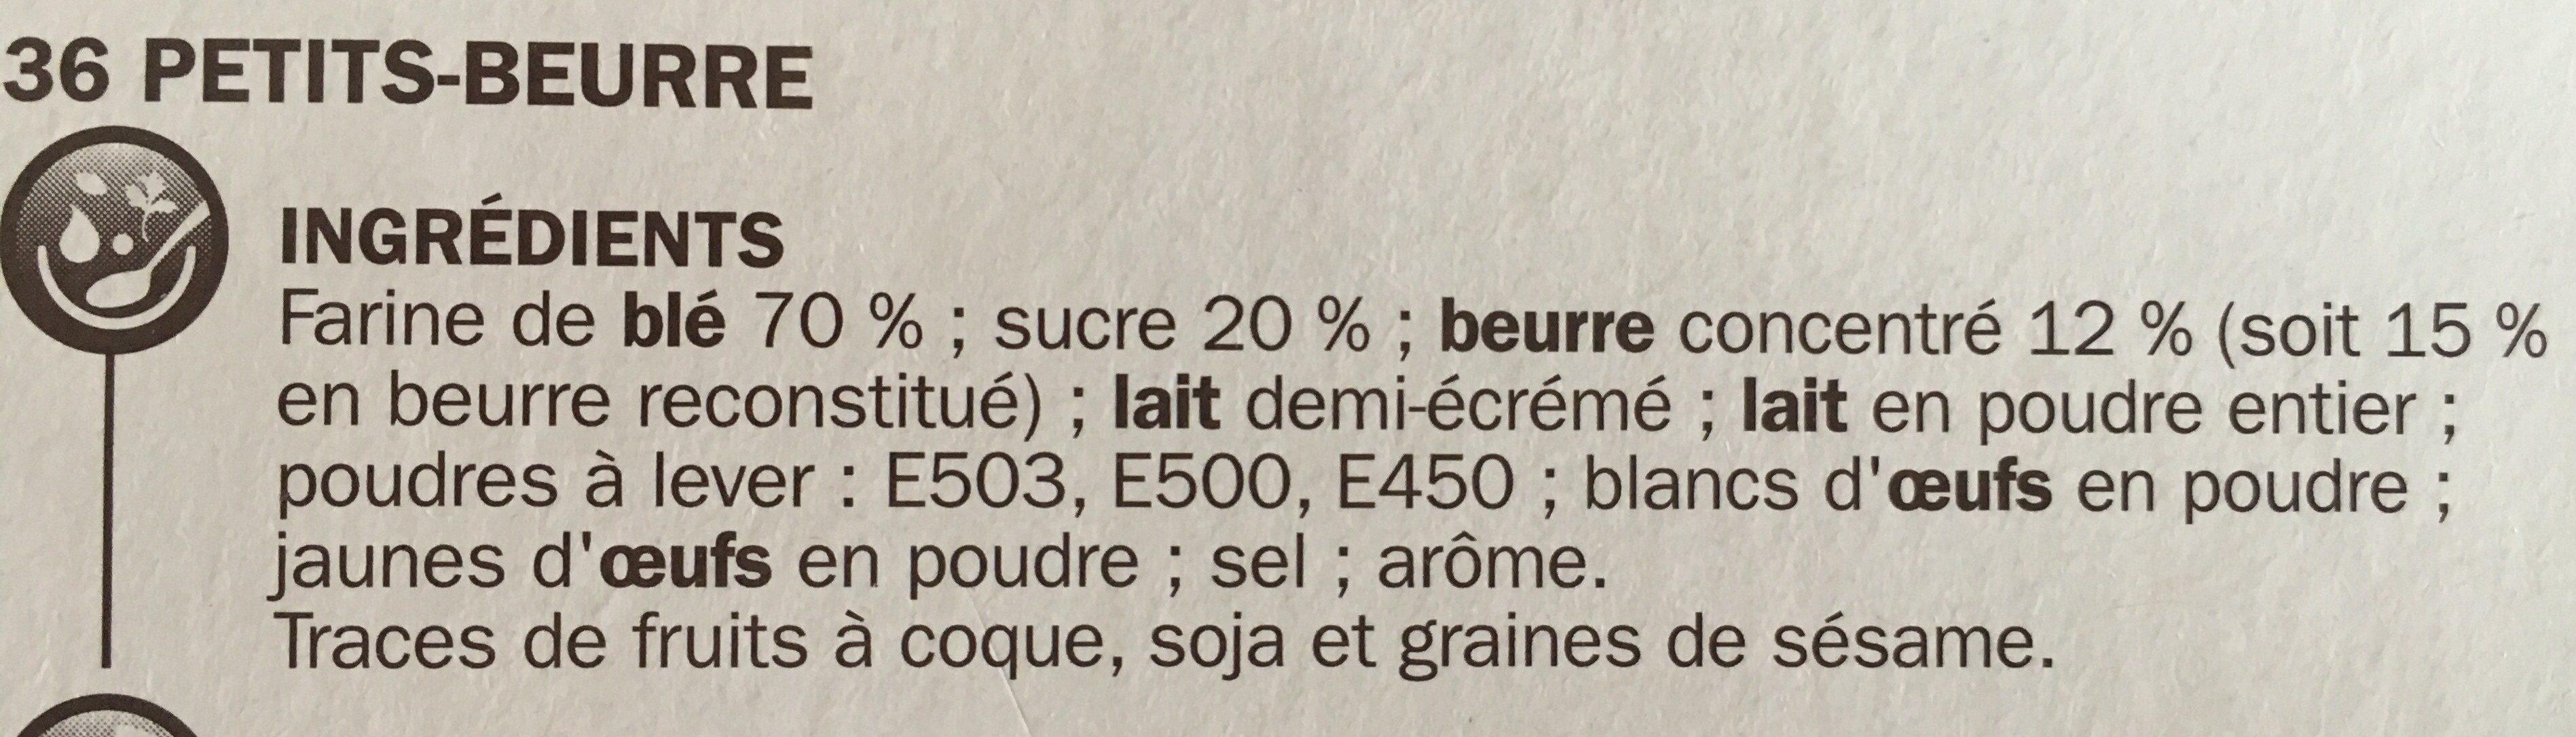 Petit beurre pocket - Ingredients - fr